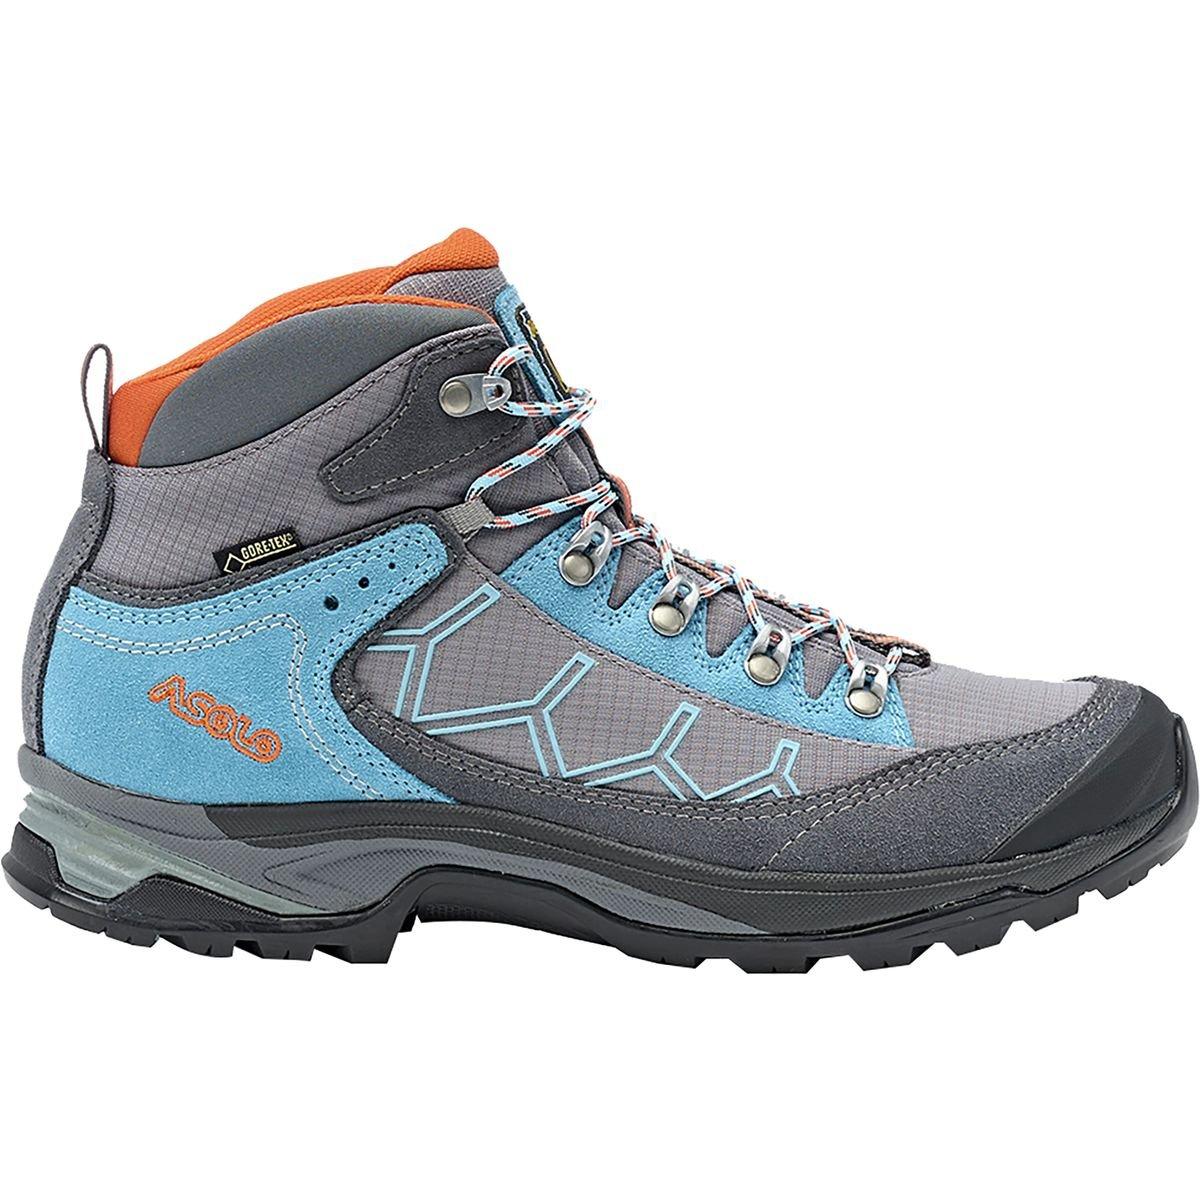 Asolo Women Falcon GV Hiking Boots B00WE3K4T8 6|GREY/STONE